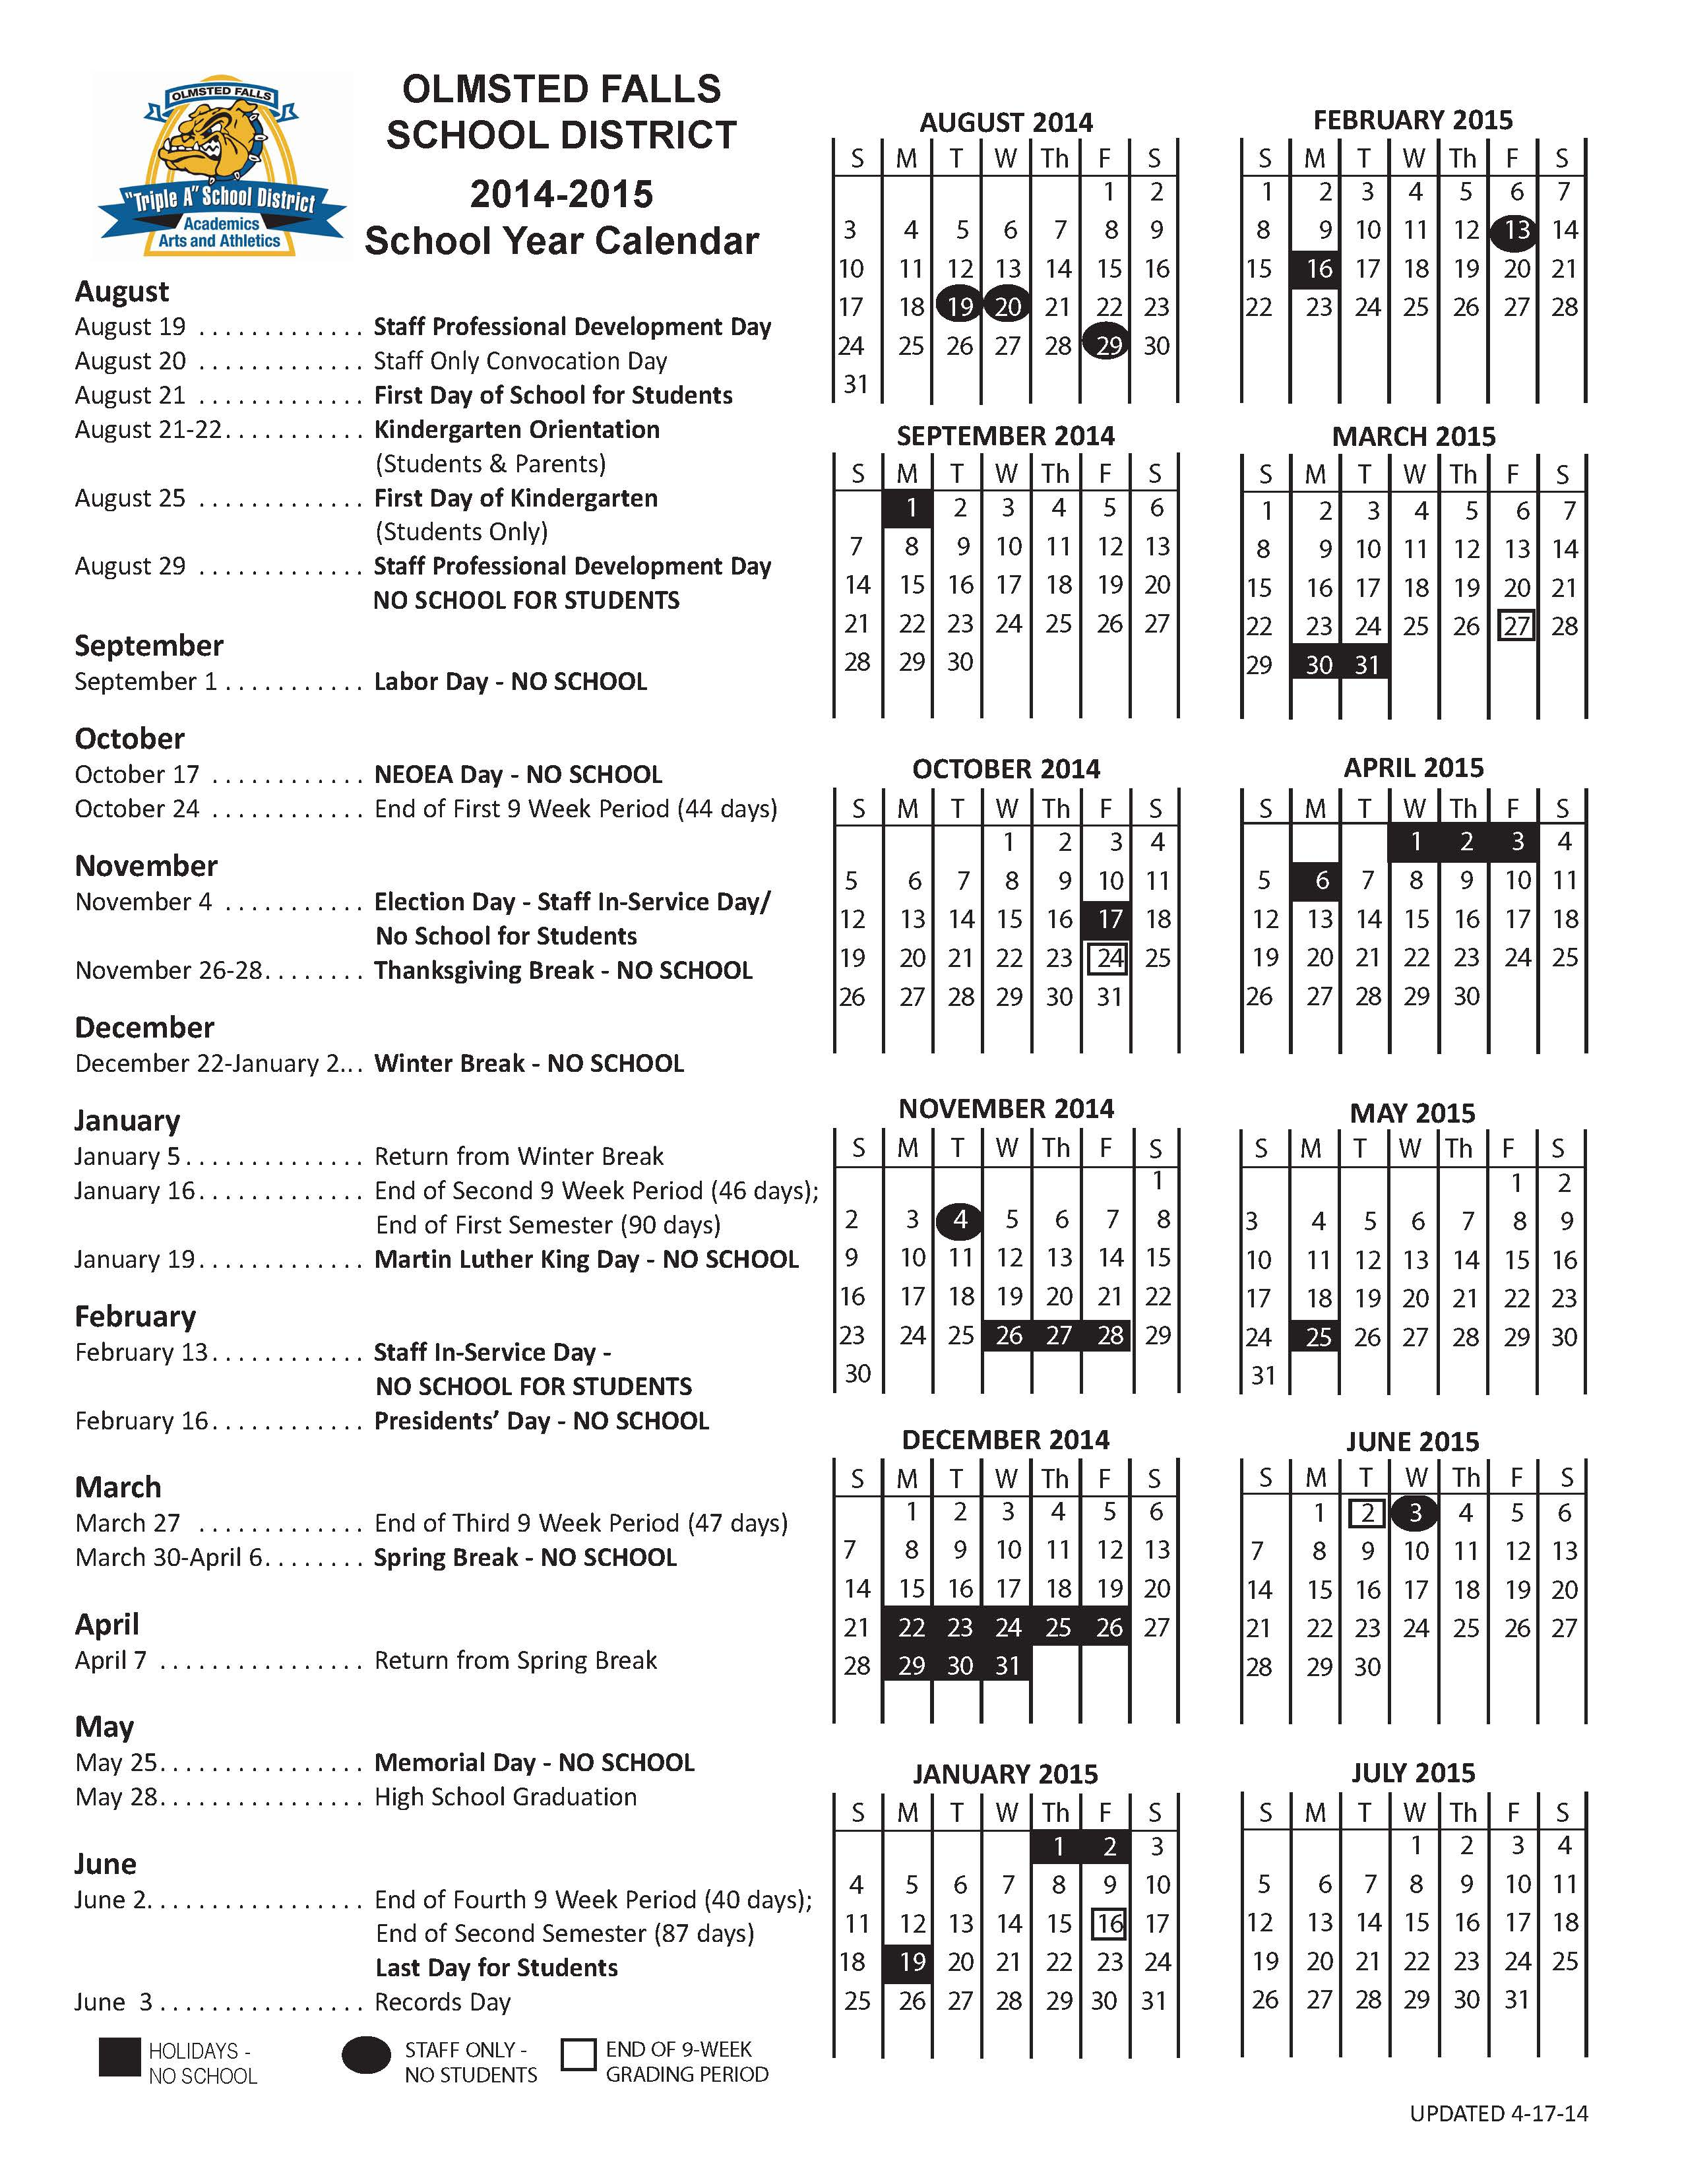 Byu Academic Calendar | Search Results | Calendar 2015